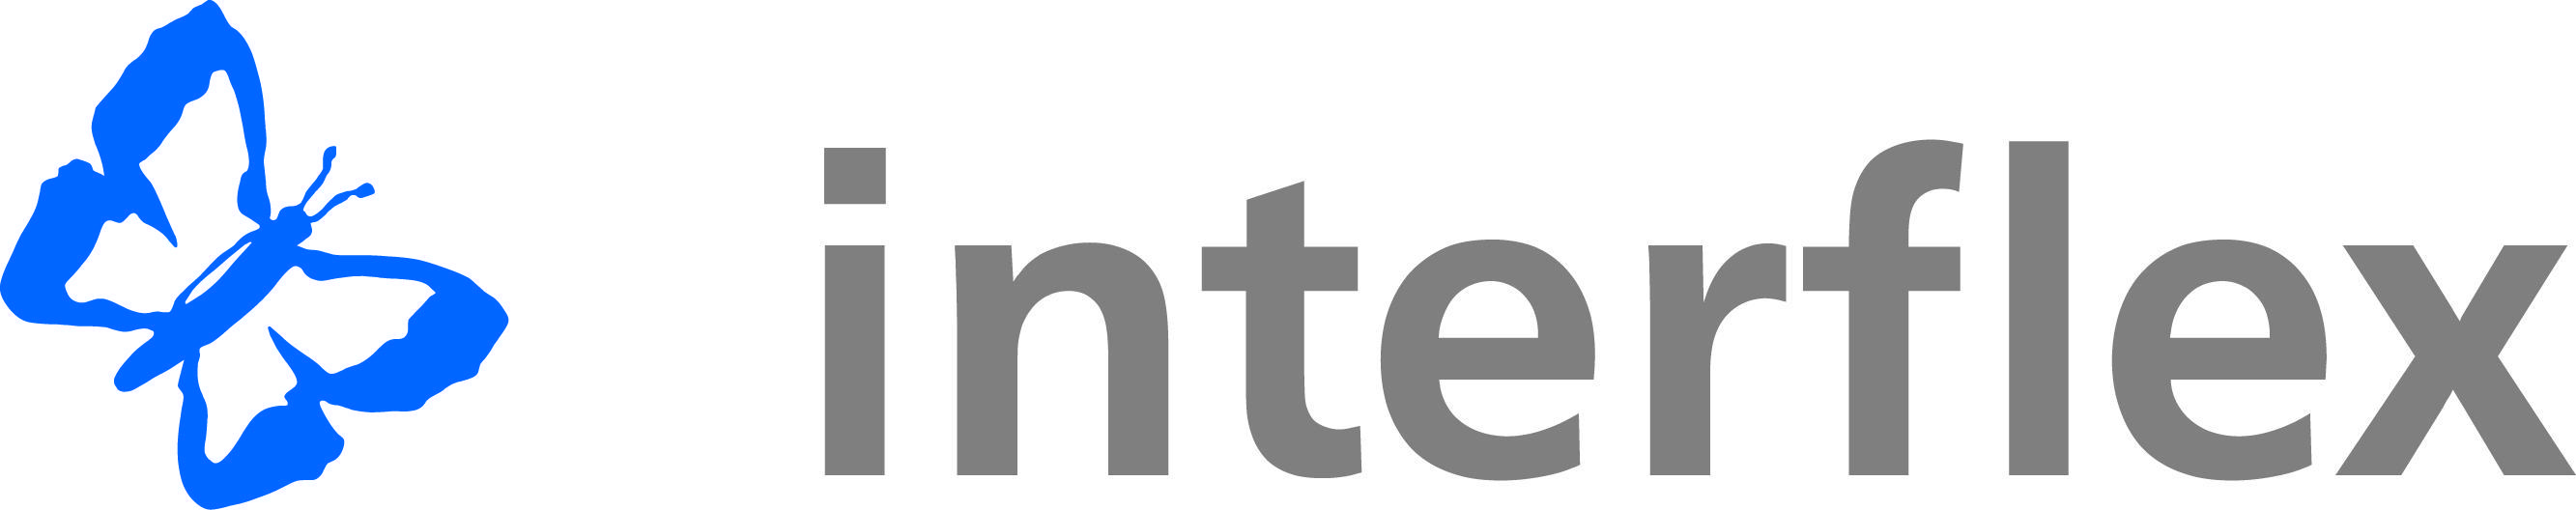 interflex logo neu - Interflex